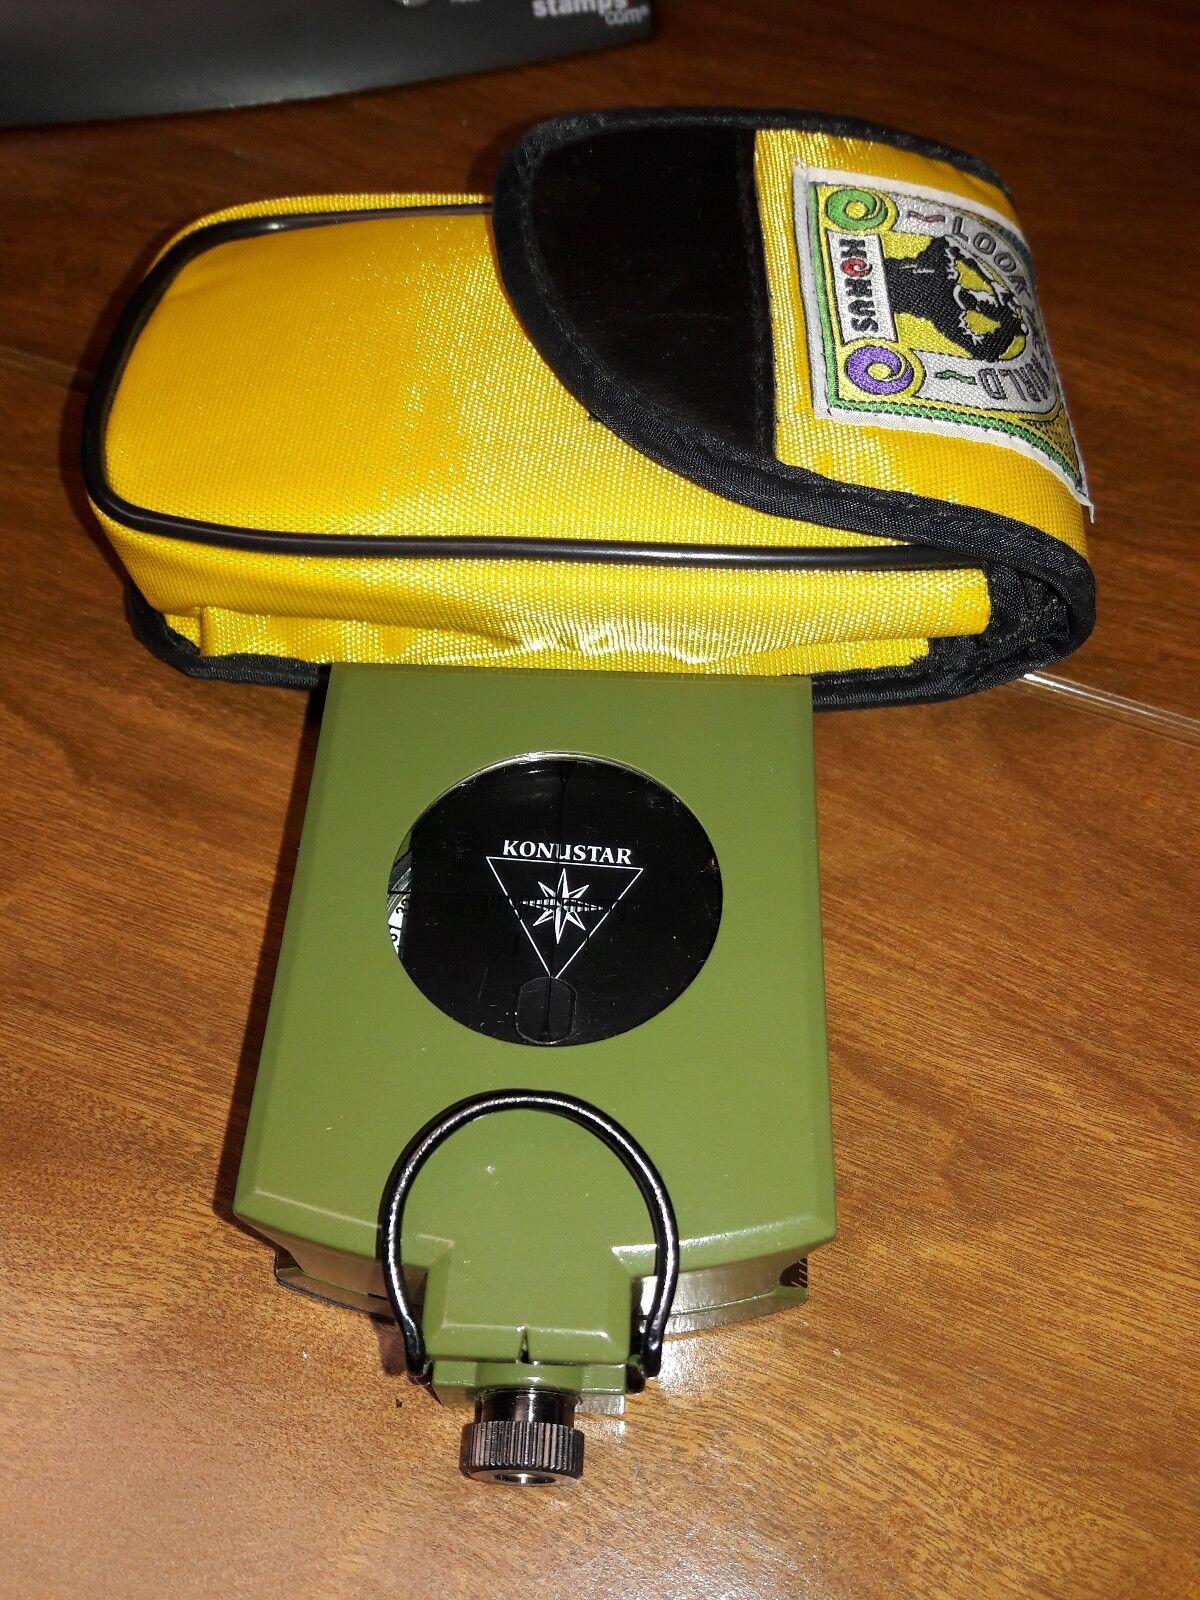 Konus Konustar Compass, mint with carry case